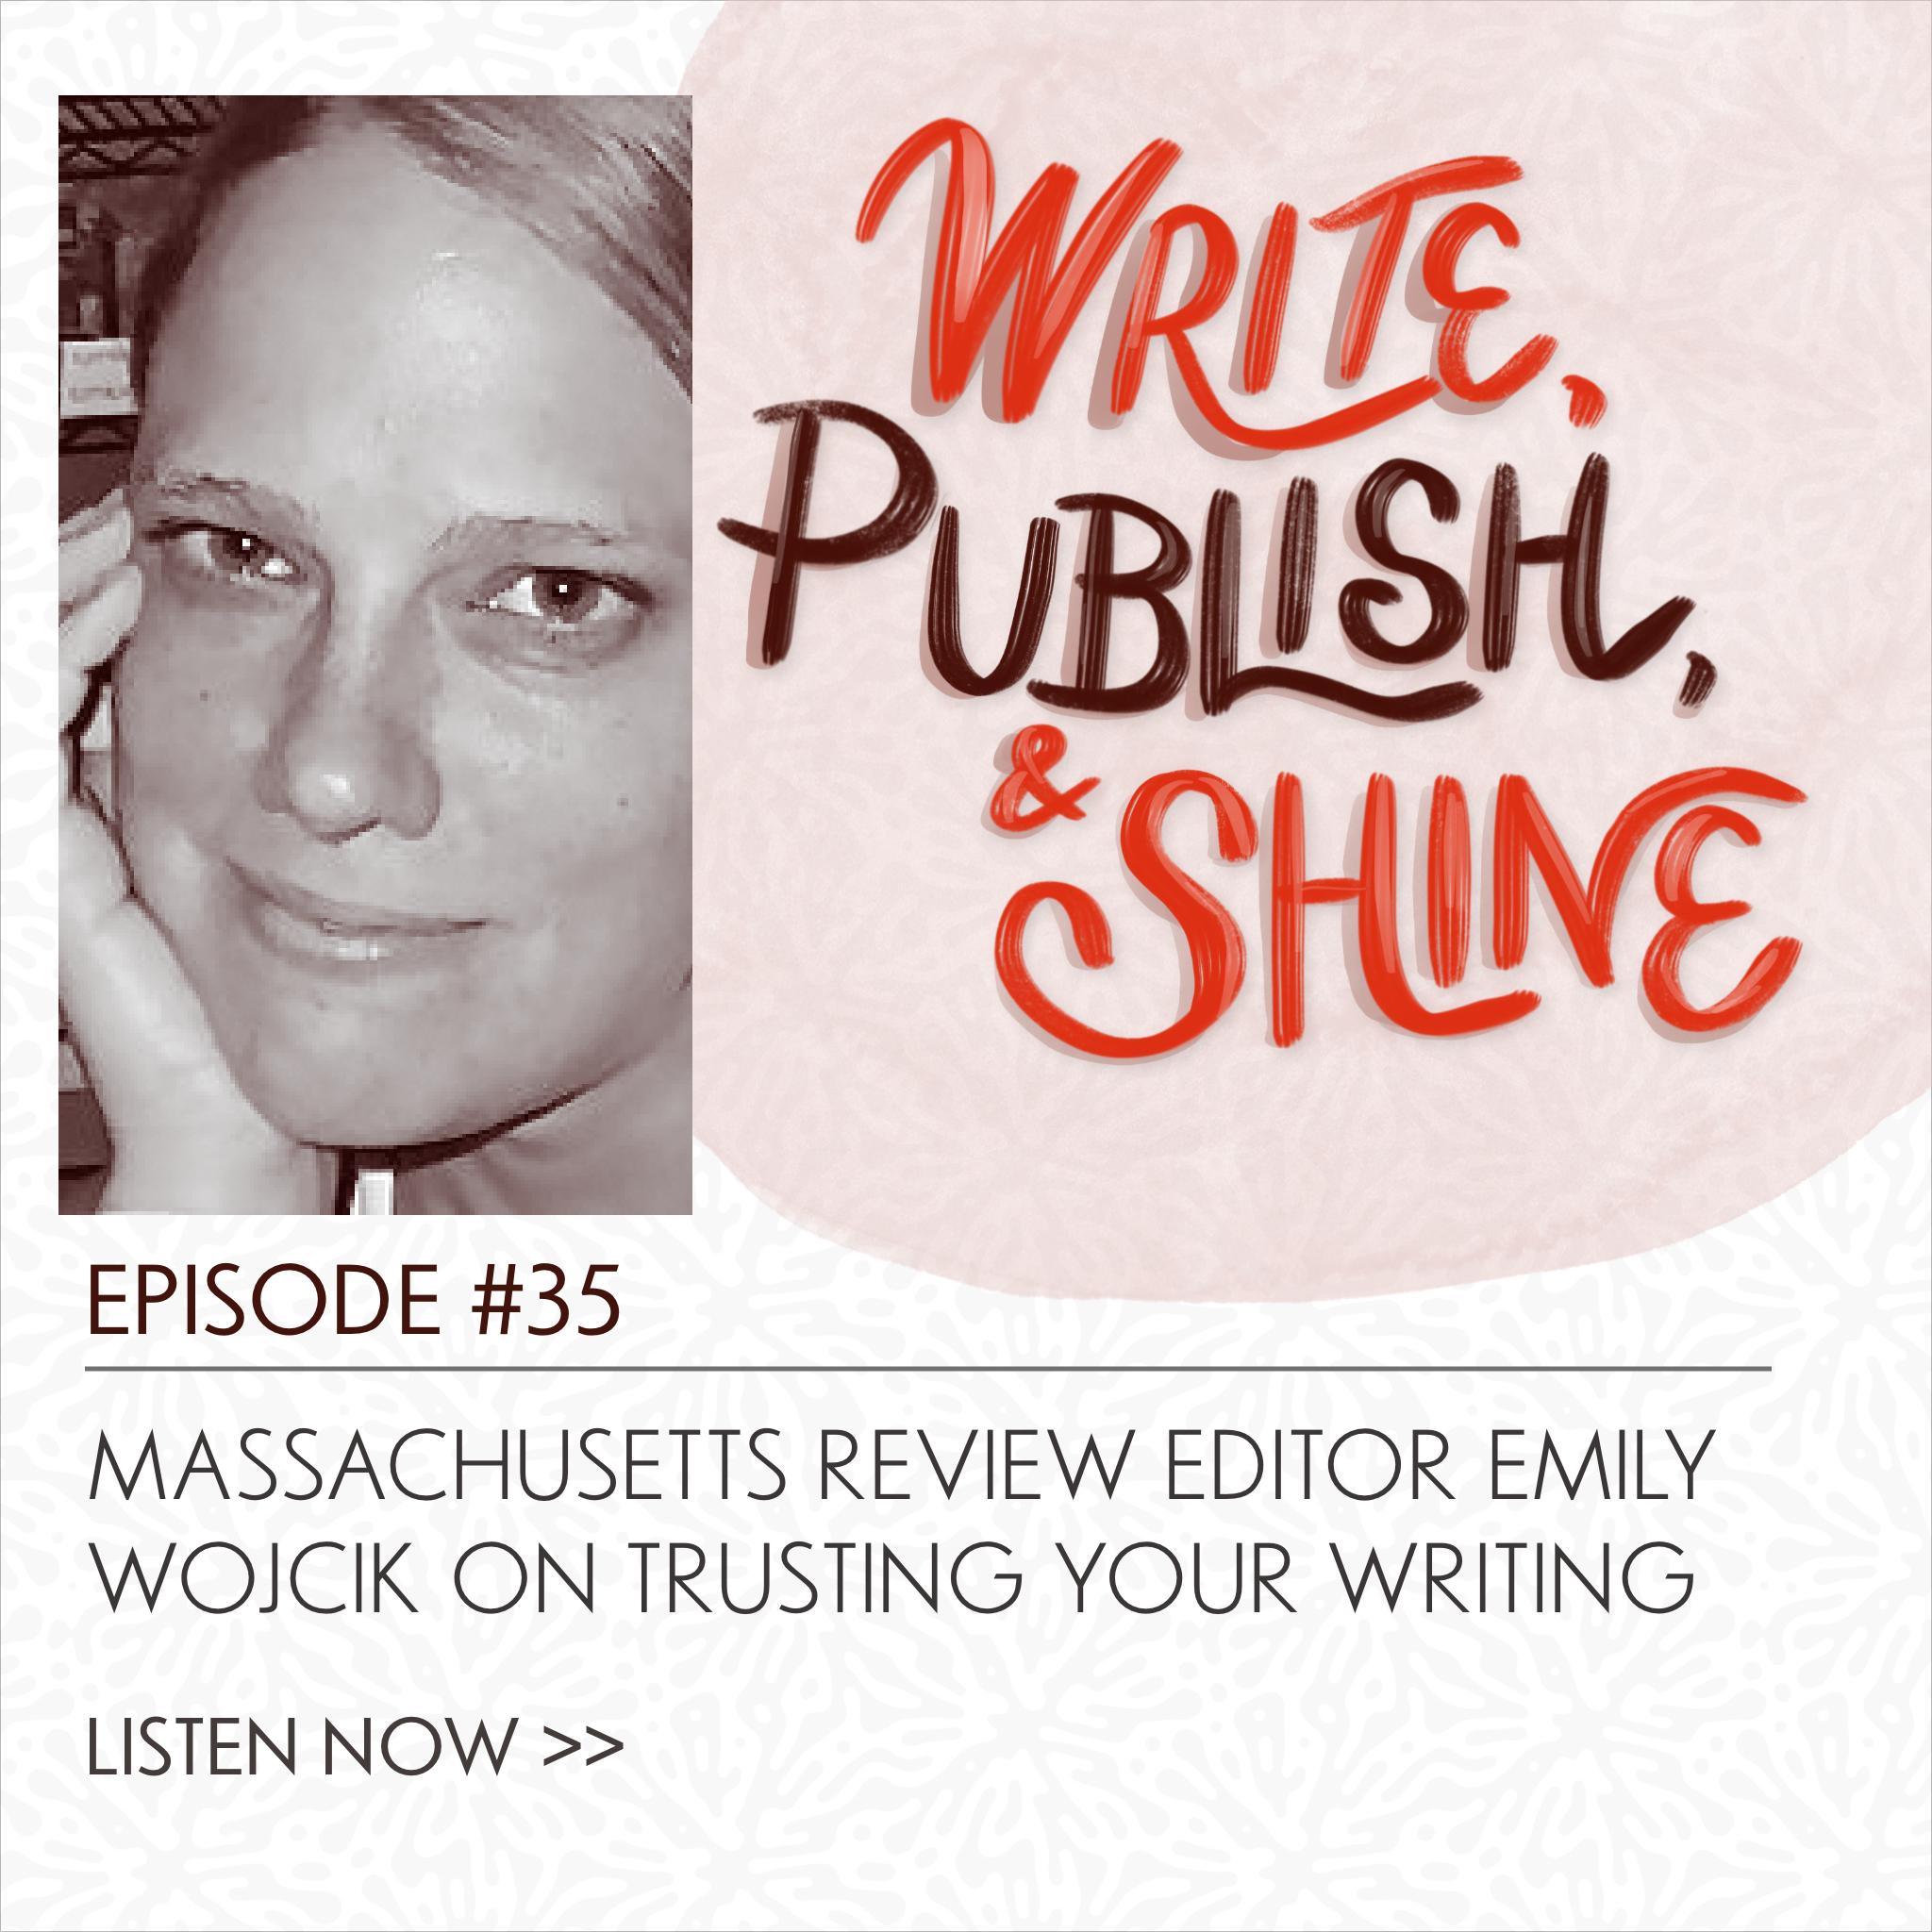 35 // Massachusetts Review Editor Emily Wojcik on Trusting Your Writing [Replay]